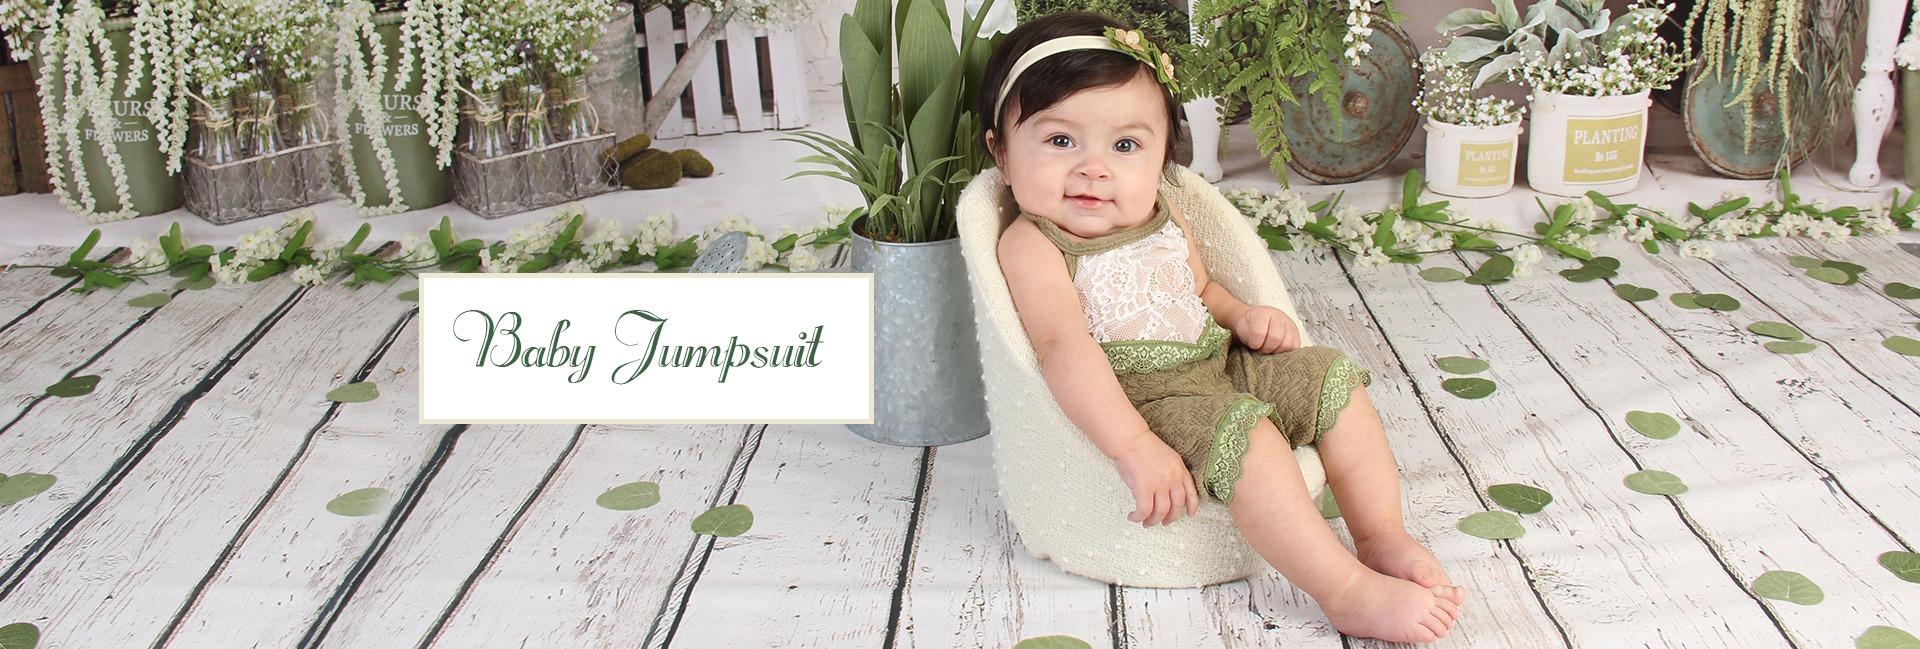 26df7ddd5 Yiwu Kapu Clothing Co., Ltd. - Baby clothing, baby shoes